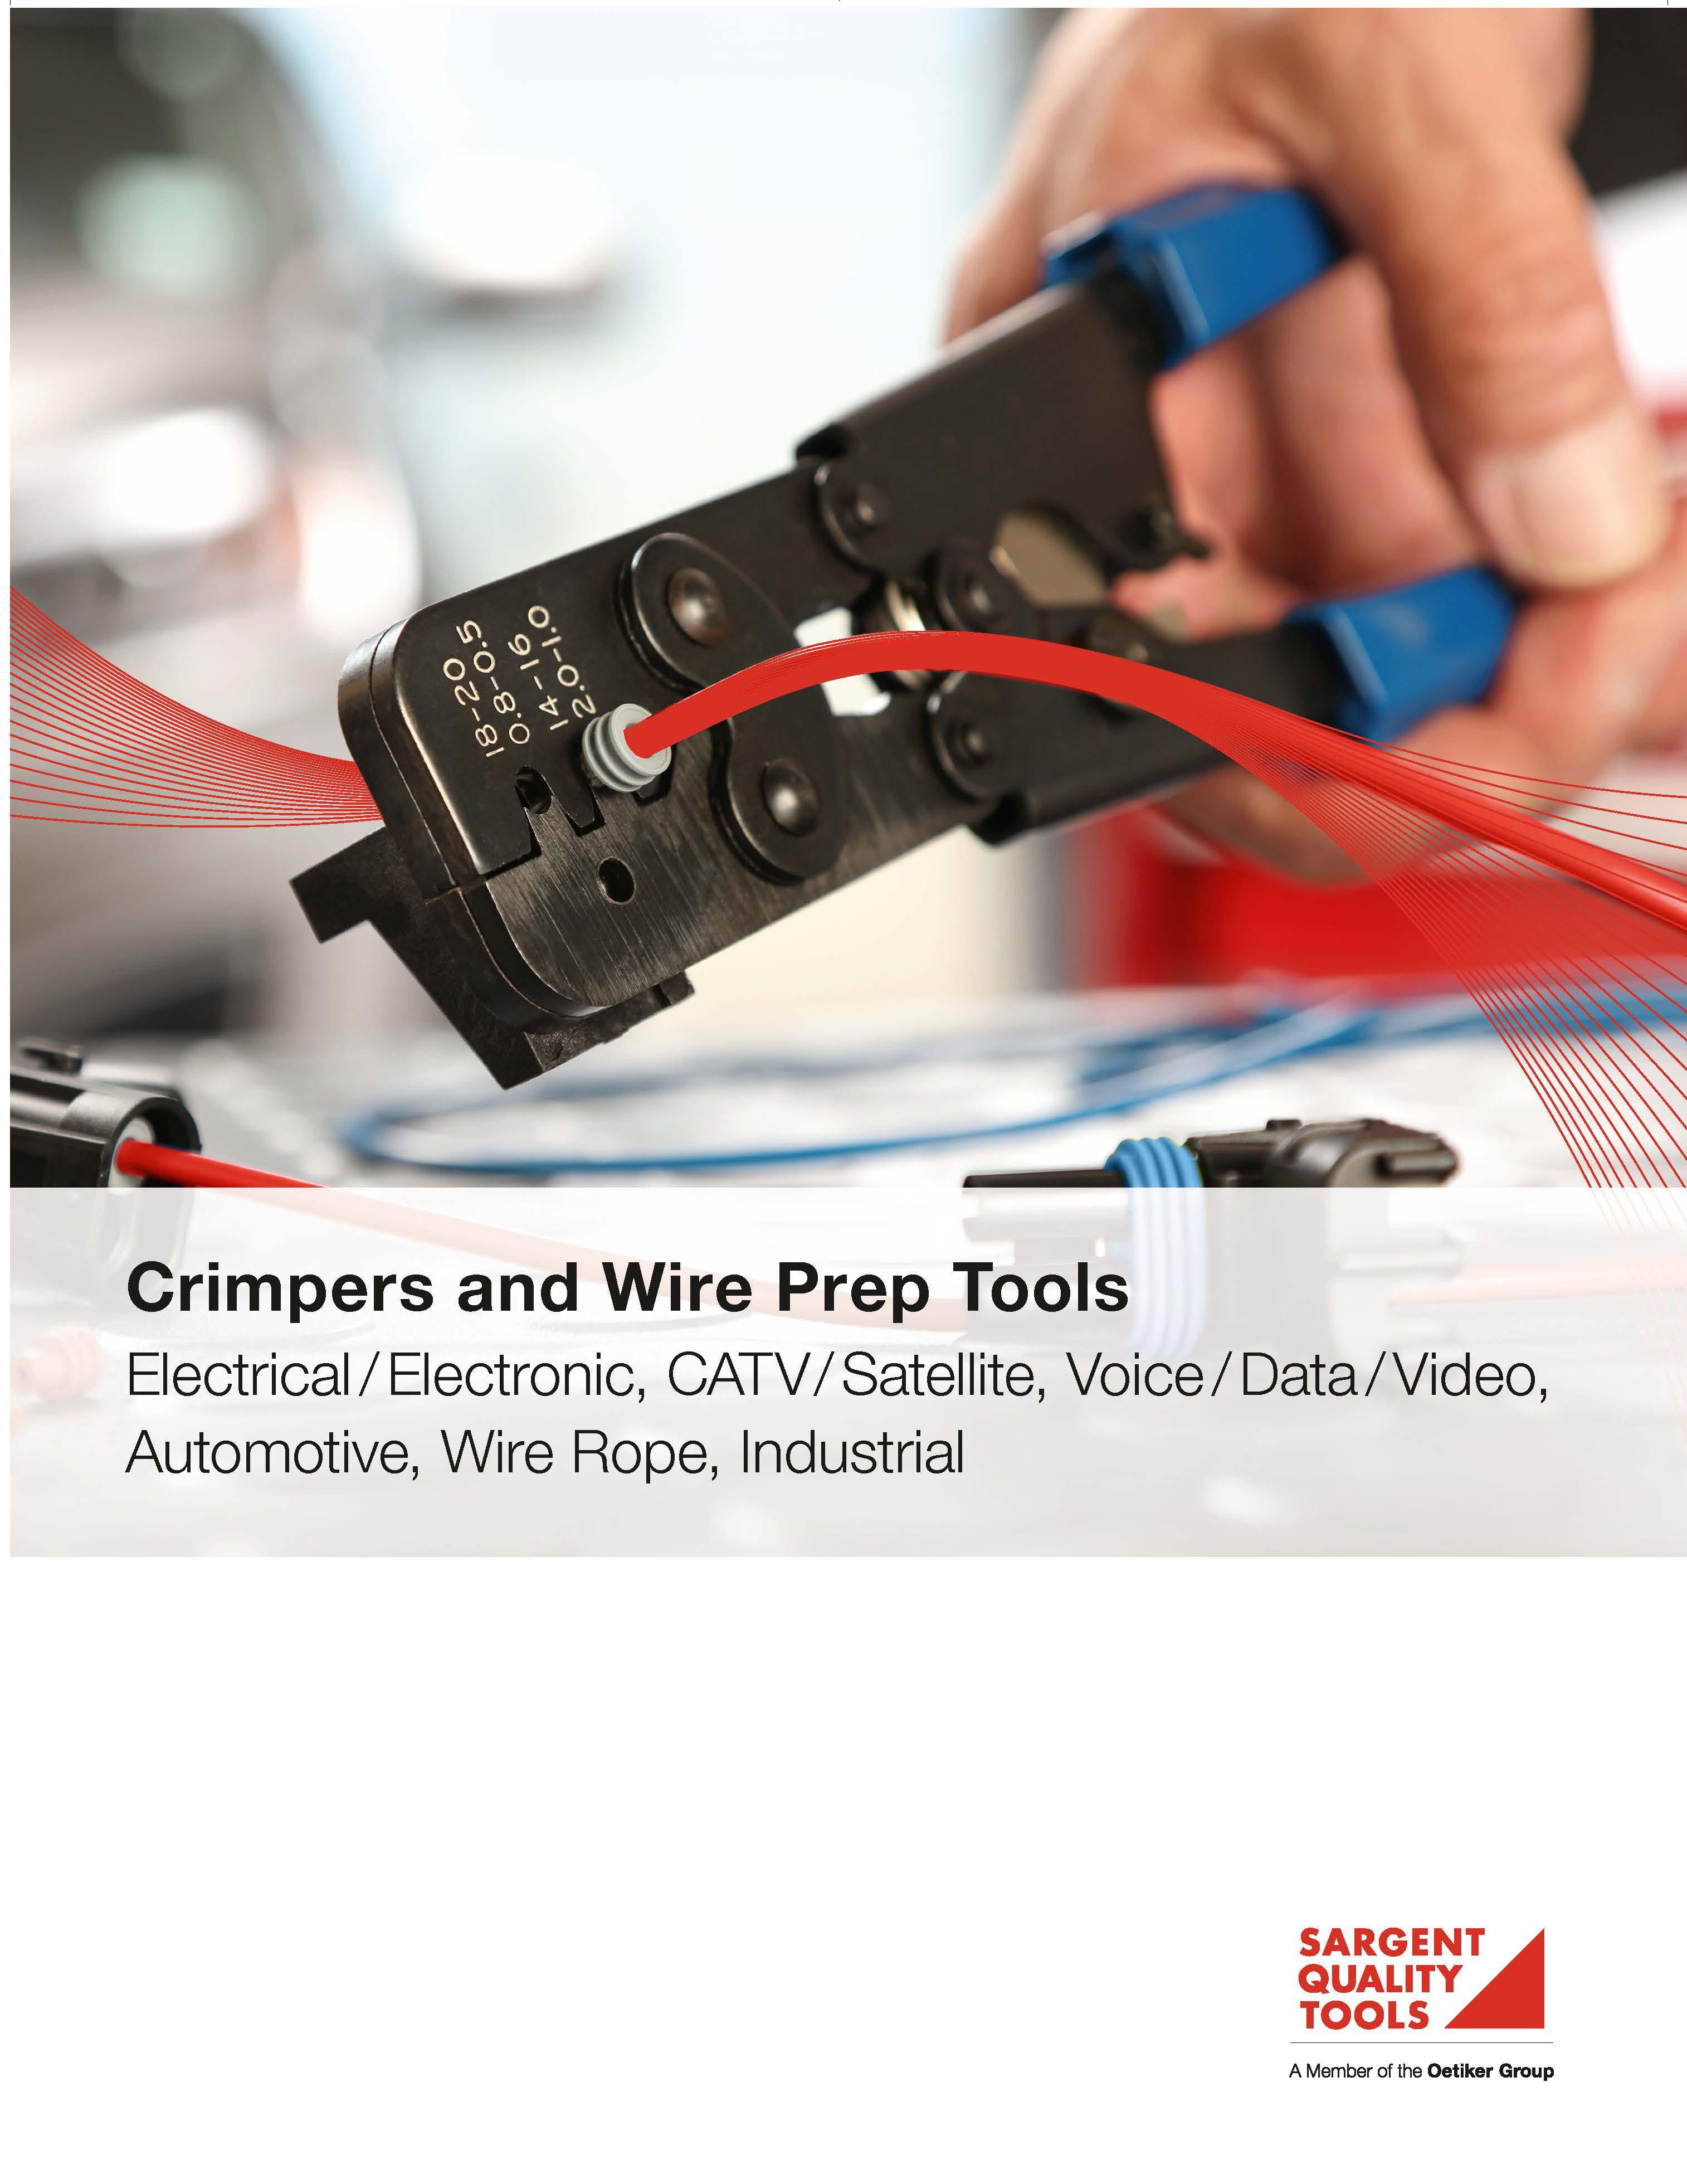 EETDA Catalog (non-plumbing tools)